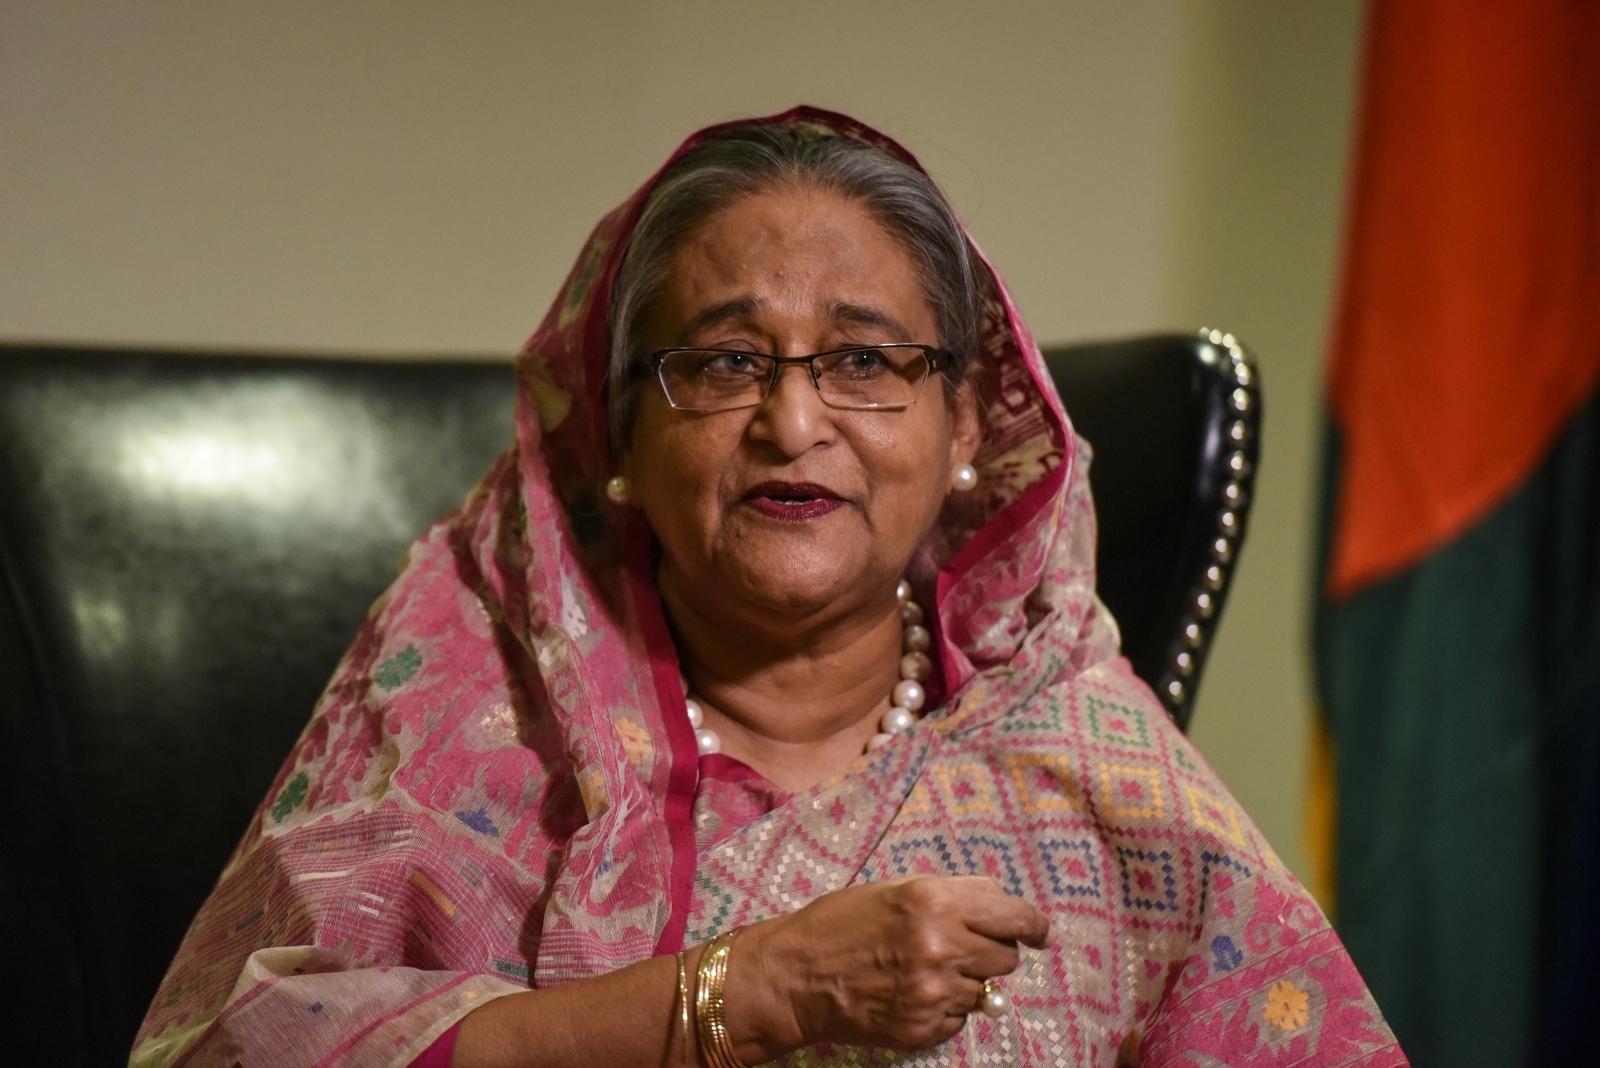 Bangladesh's Prime Minister Sheikh Hasina Wazed